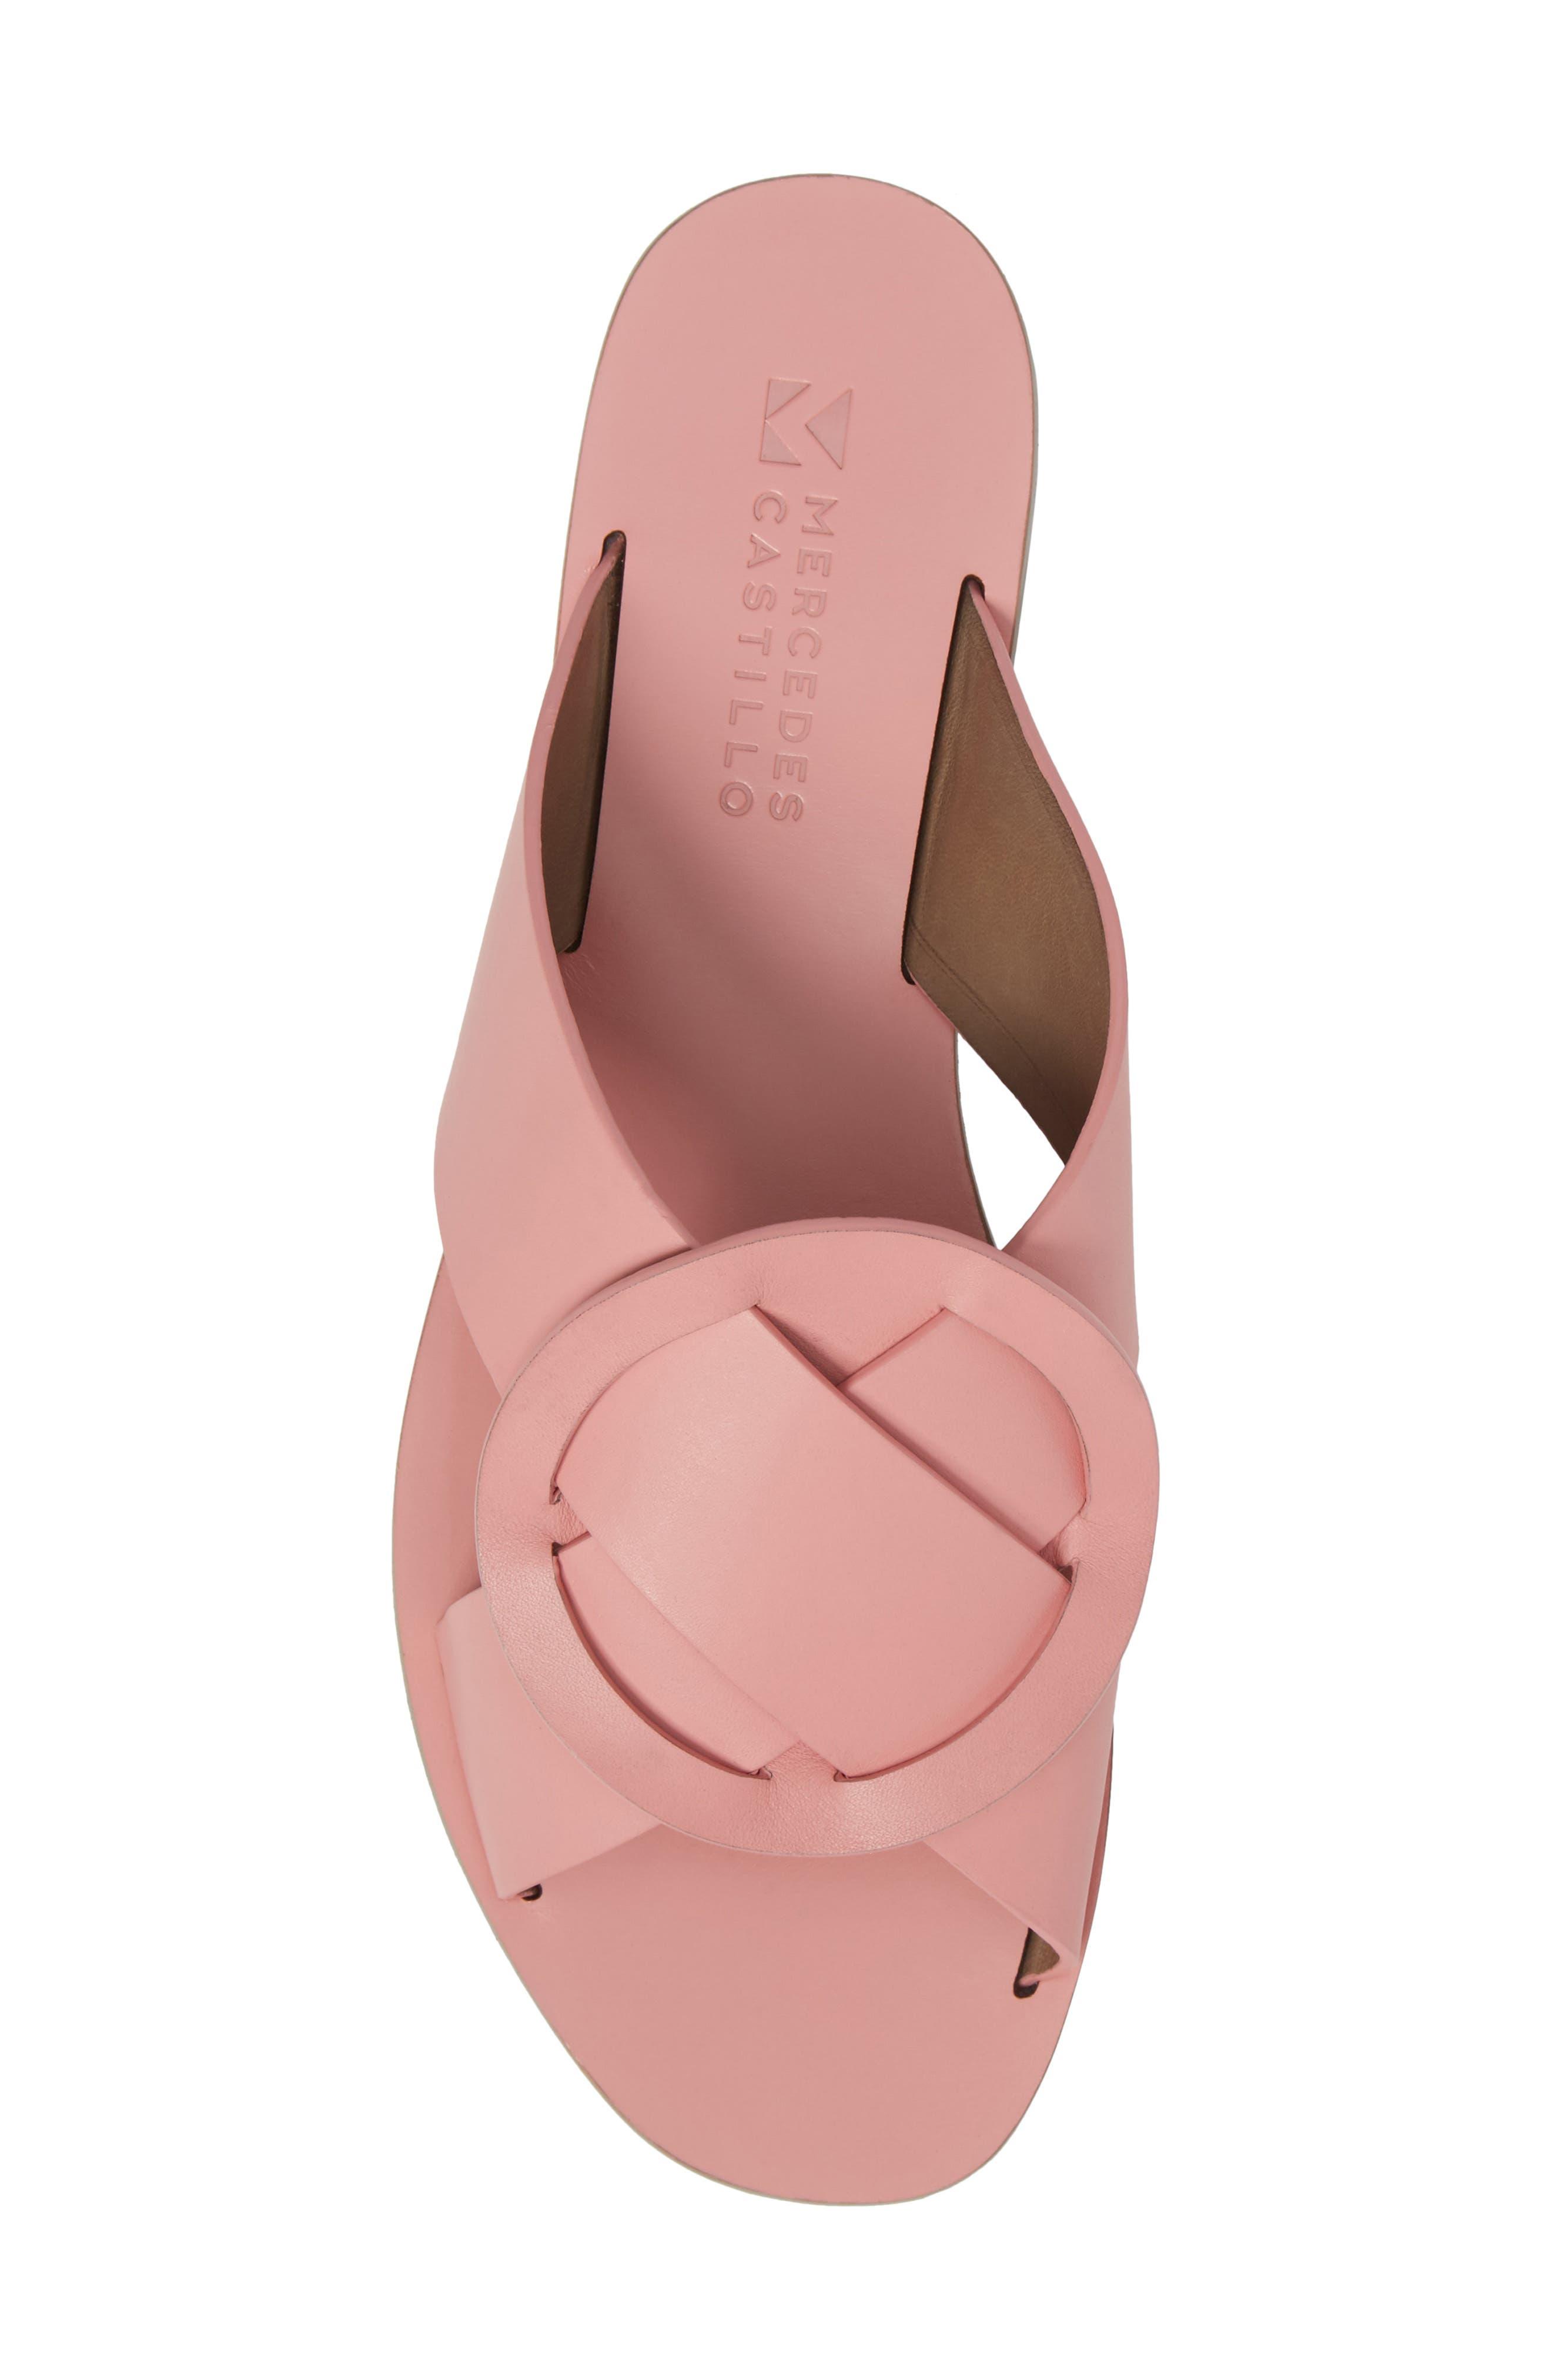 Carlein Slide Sandal,                             Alternate thumbnail 6, color,                             Pink Peony Leather